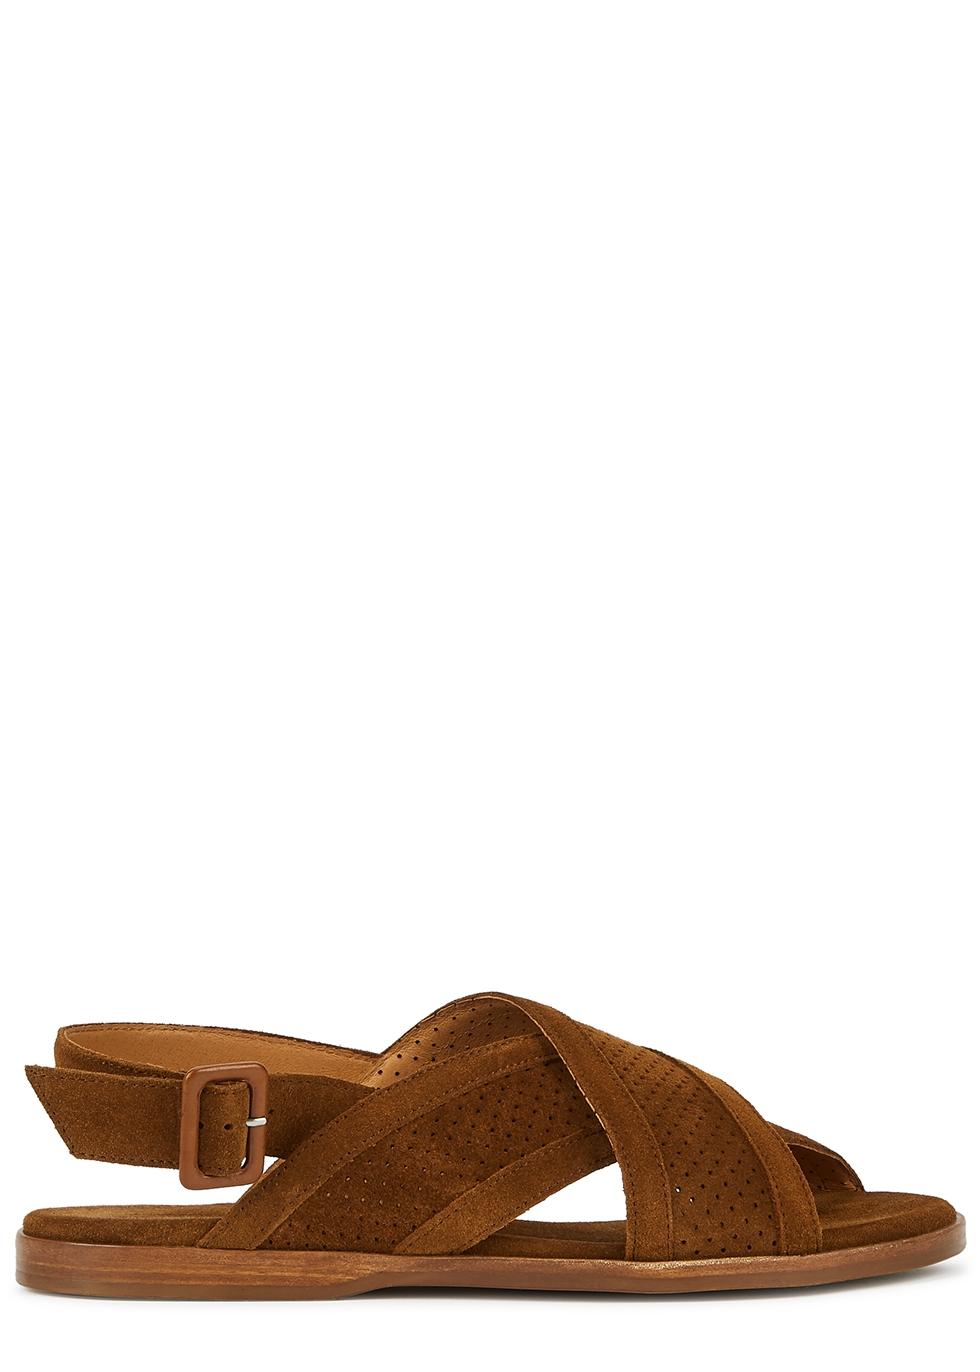 Leila brown suede sandals